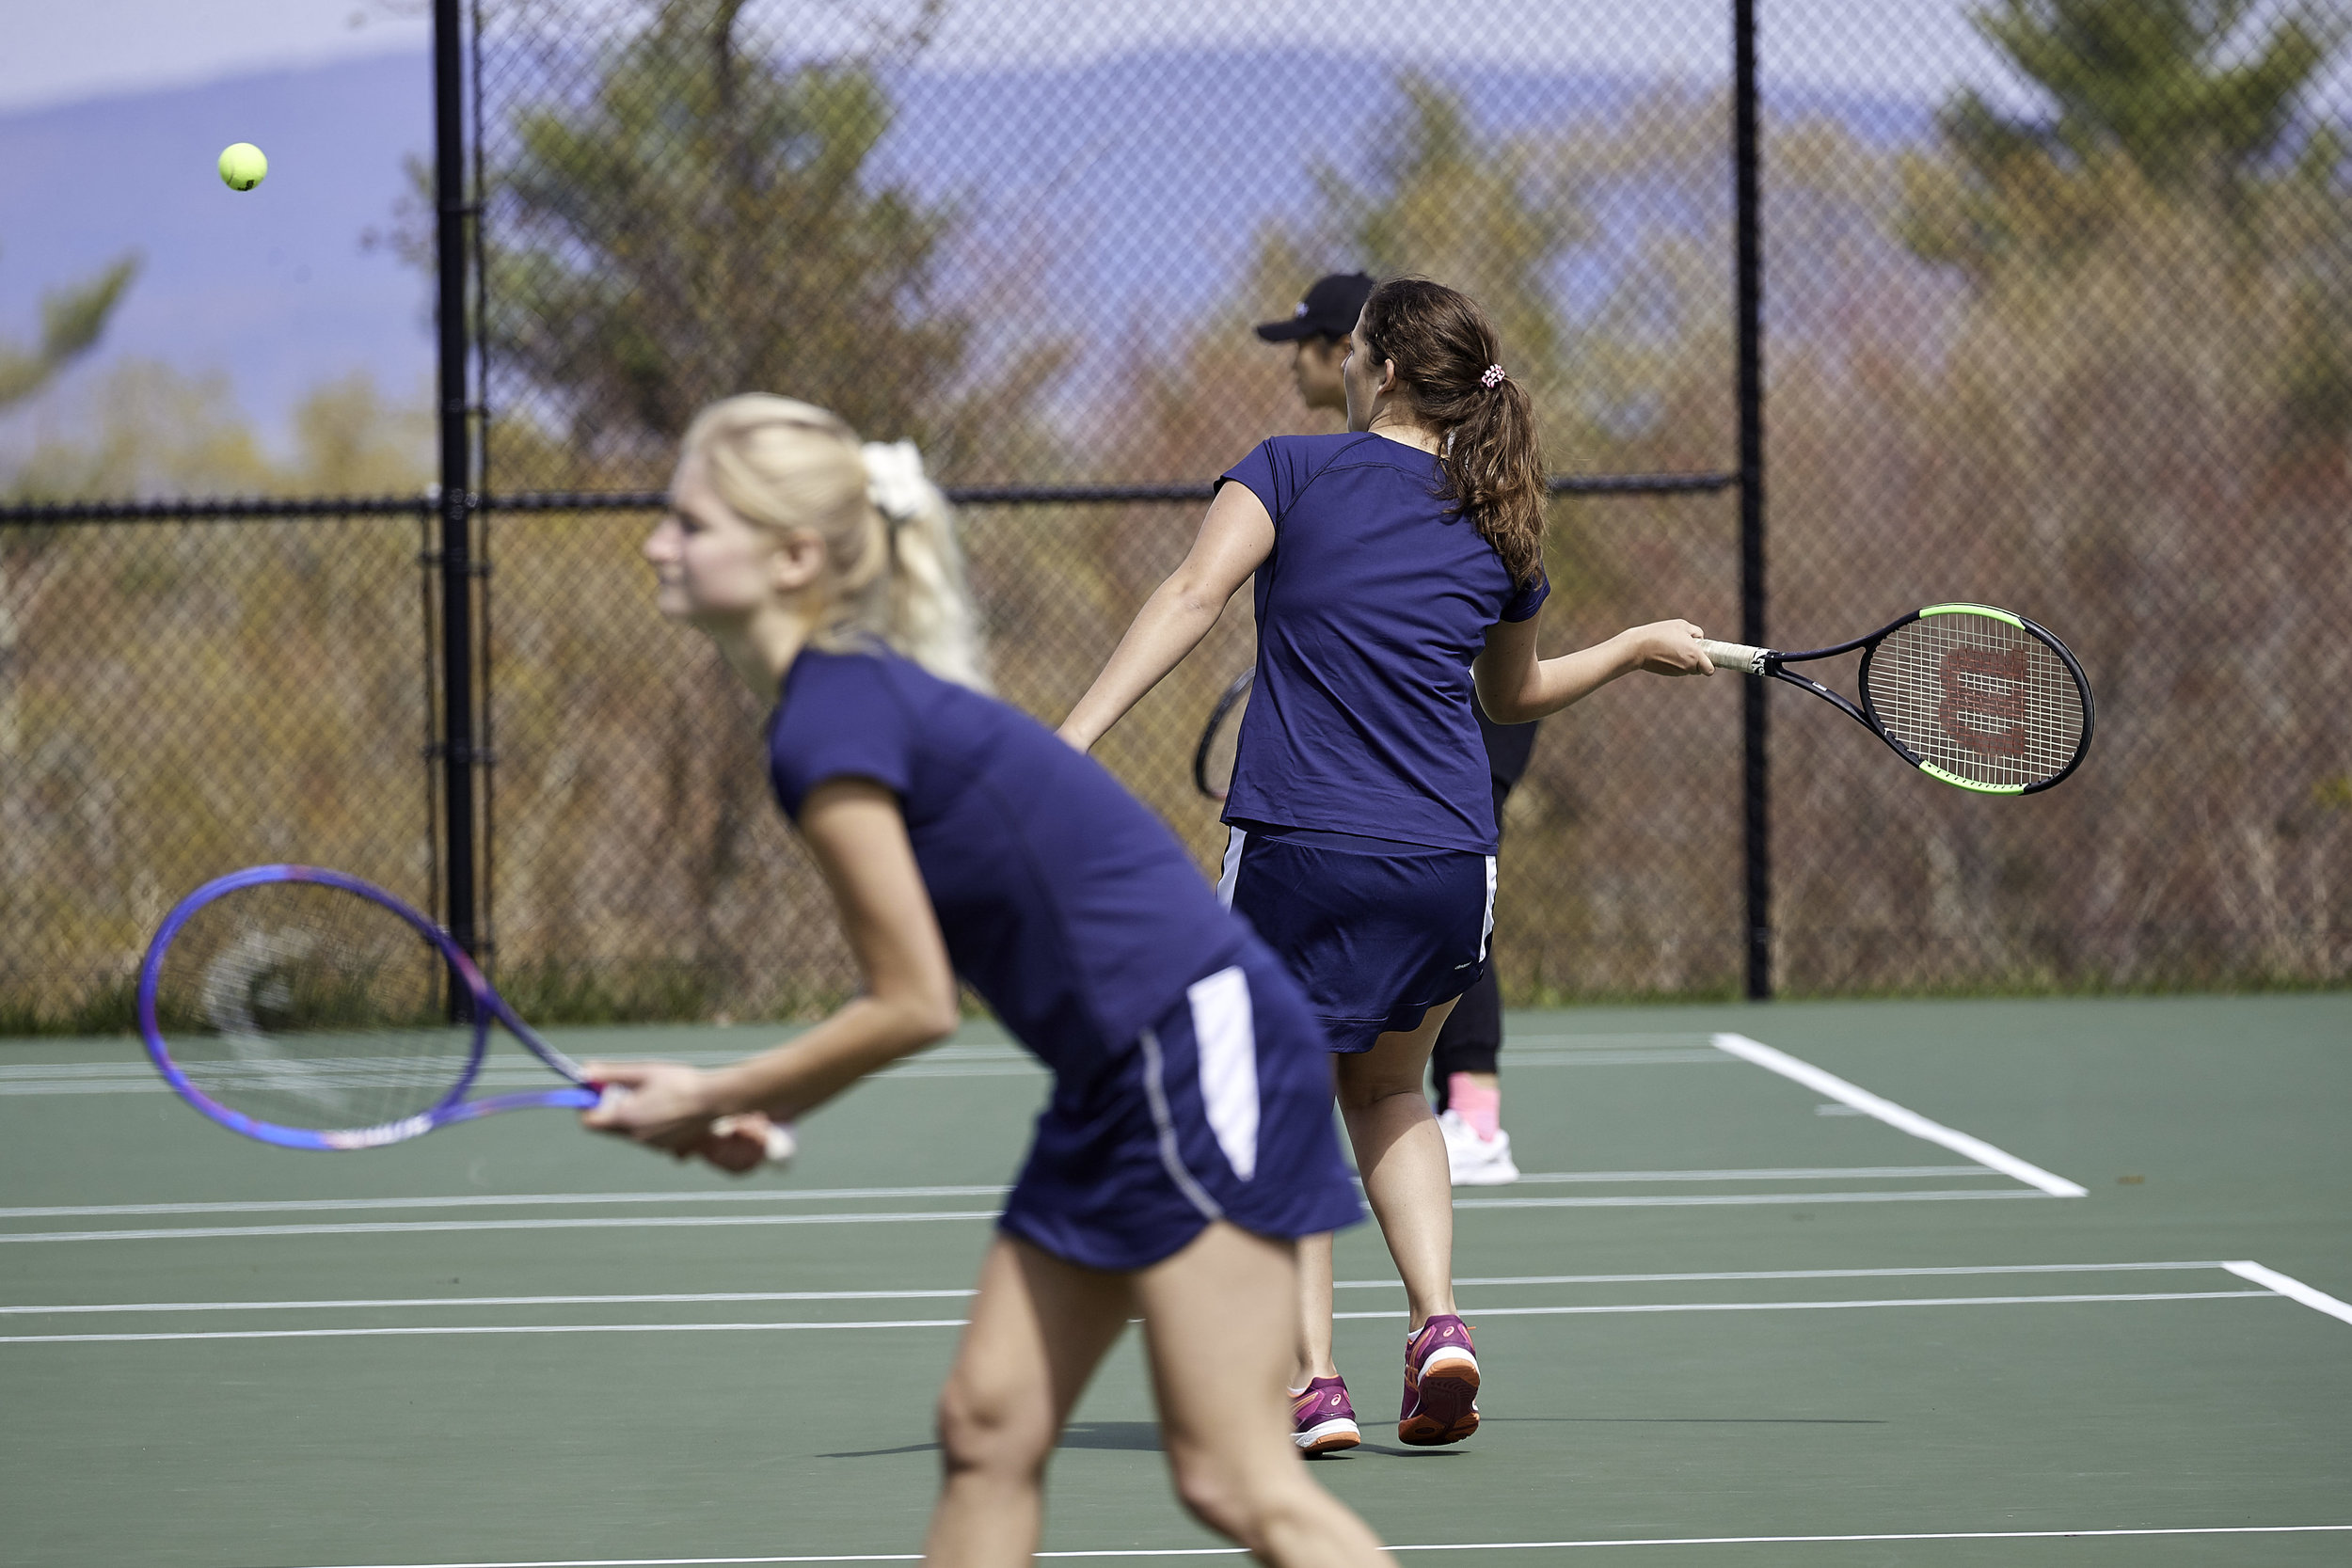 Girls Tennis vs. Winchendon School - May 15, 2019 -195174.jpg